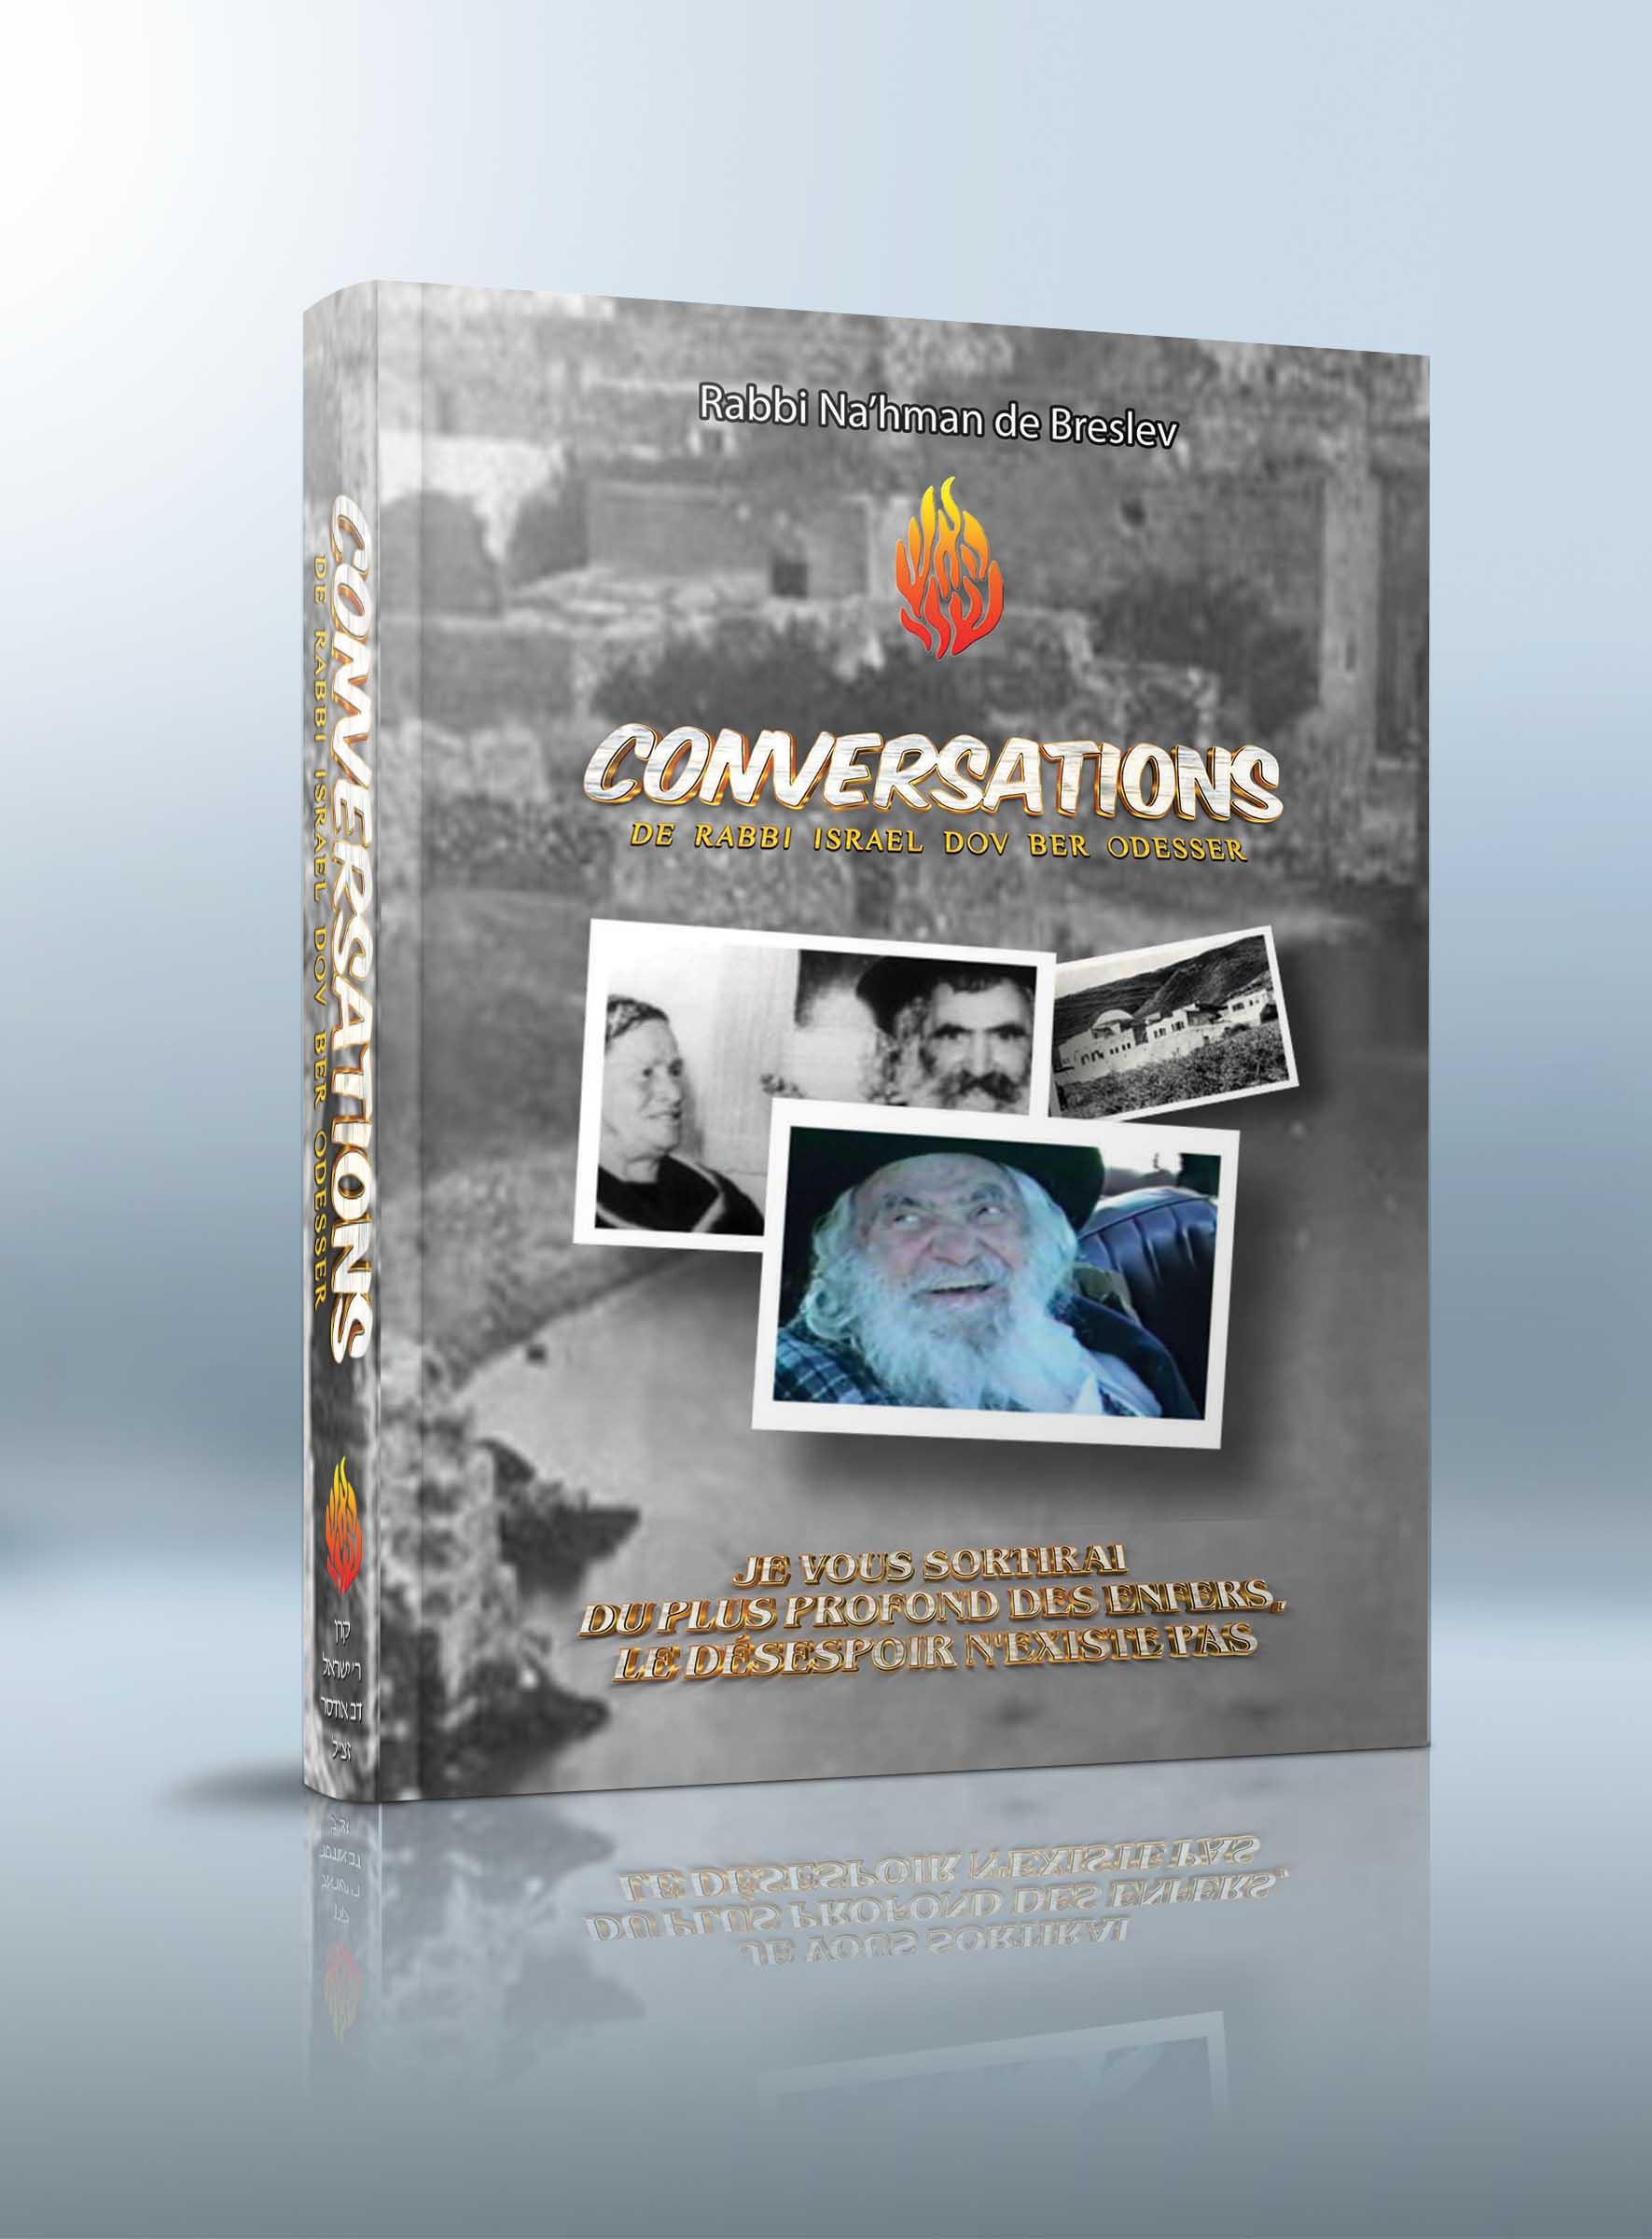 CONVERSATIONS DE RABBI ISRAËL DOV ODESSER